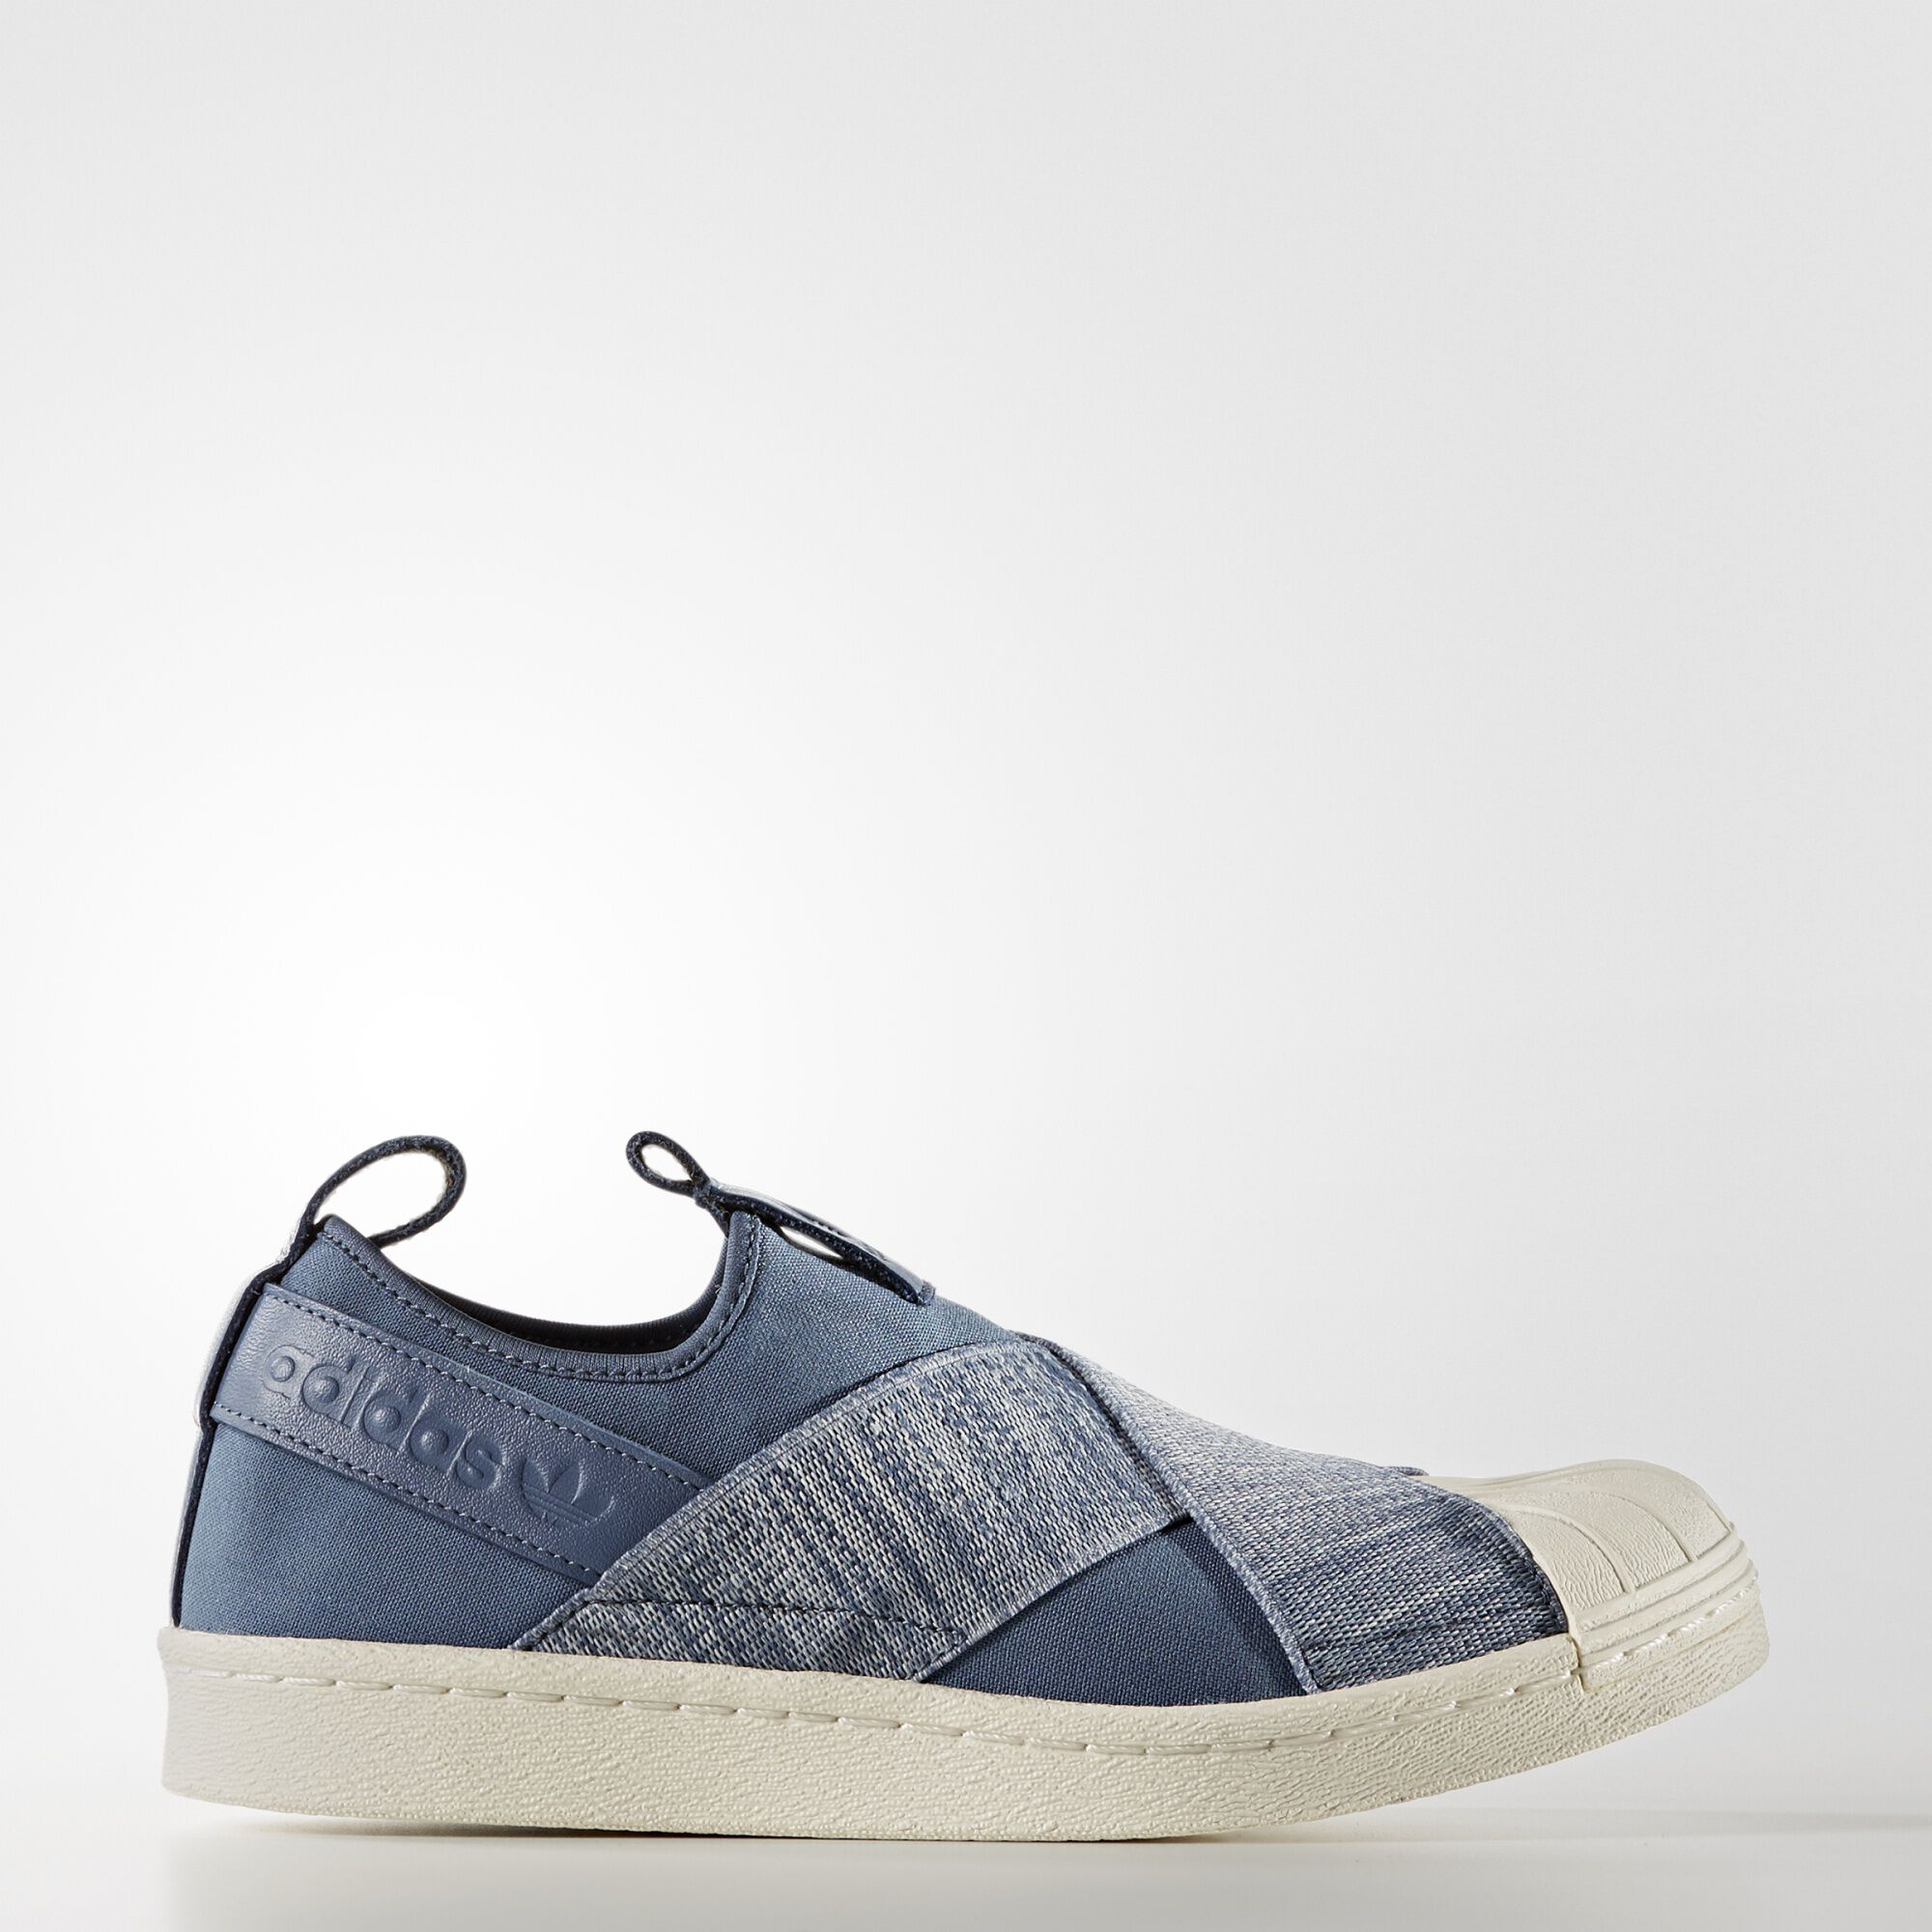 Rosa Adidas Originale Scarpe Comprare Adidas Negozio Online Comprare Scarpe Adidas 368642